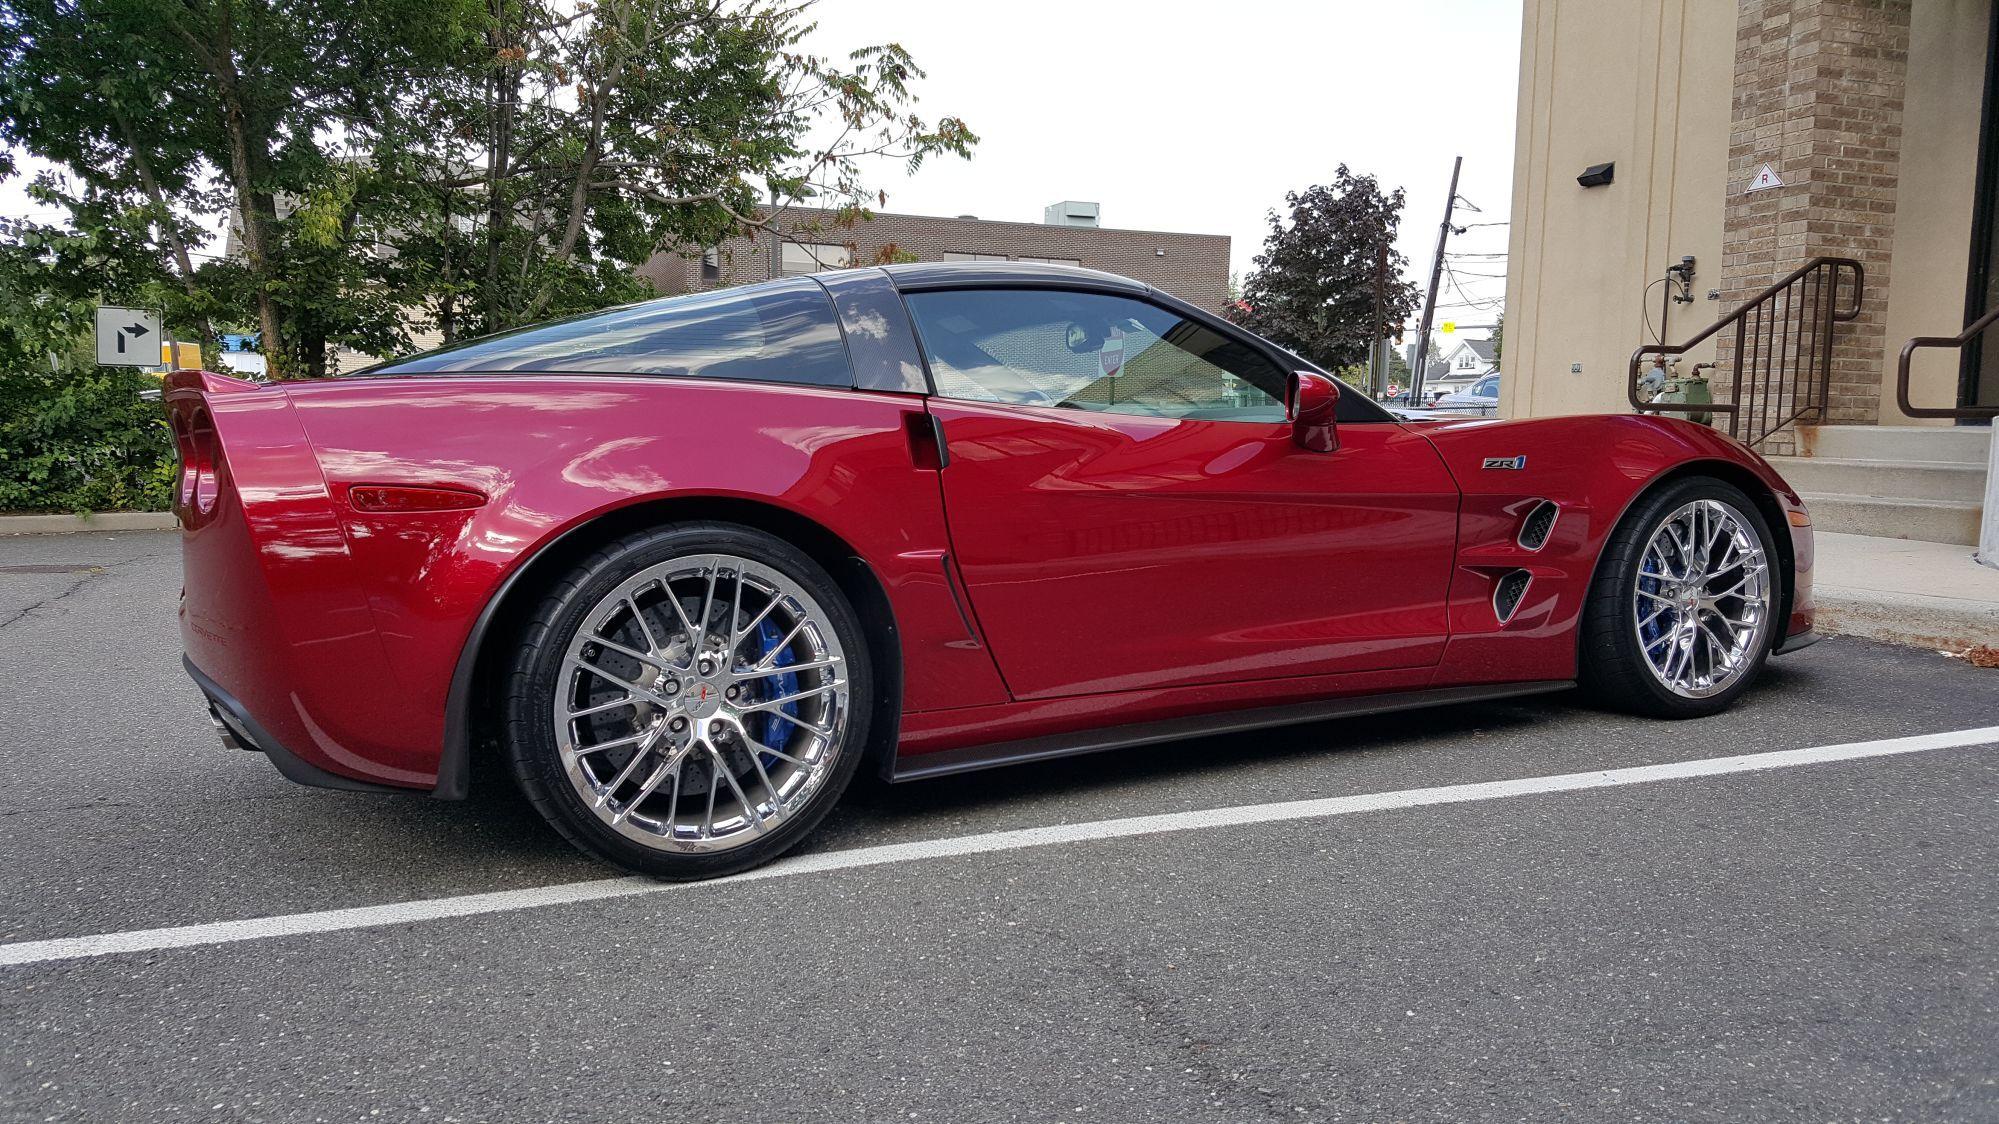 Crystal red color variation car to car corvetteforum chevrolet corvette forum discussion